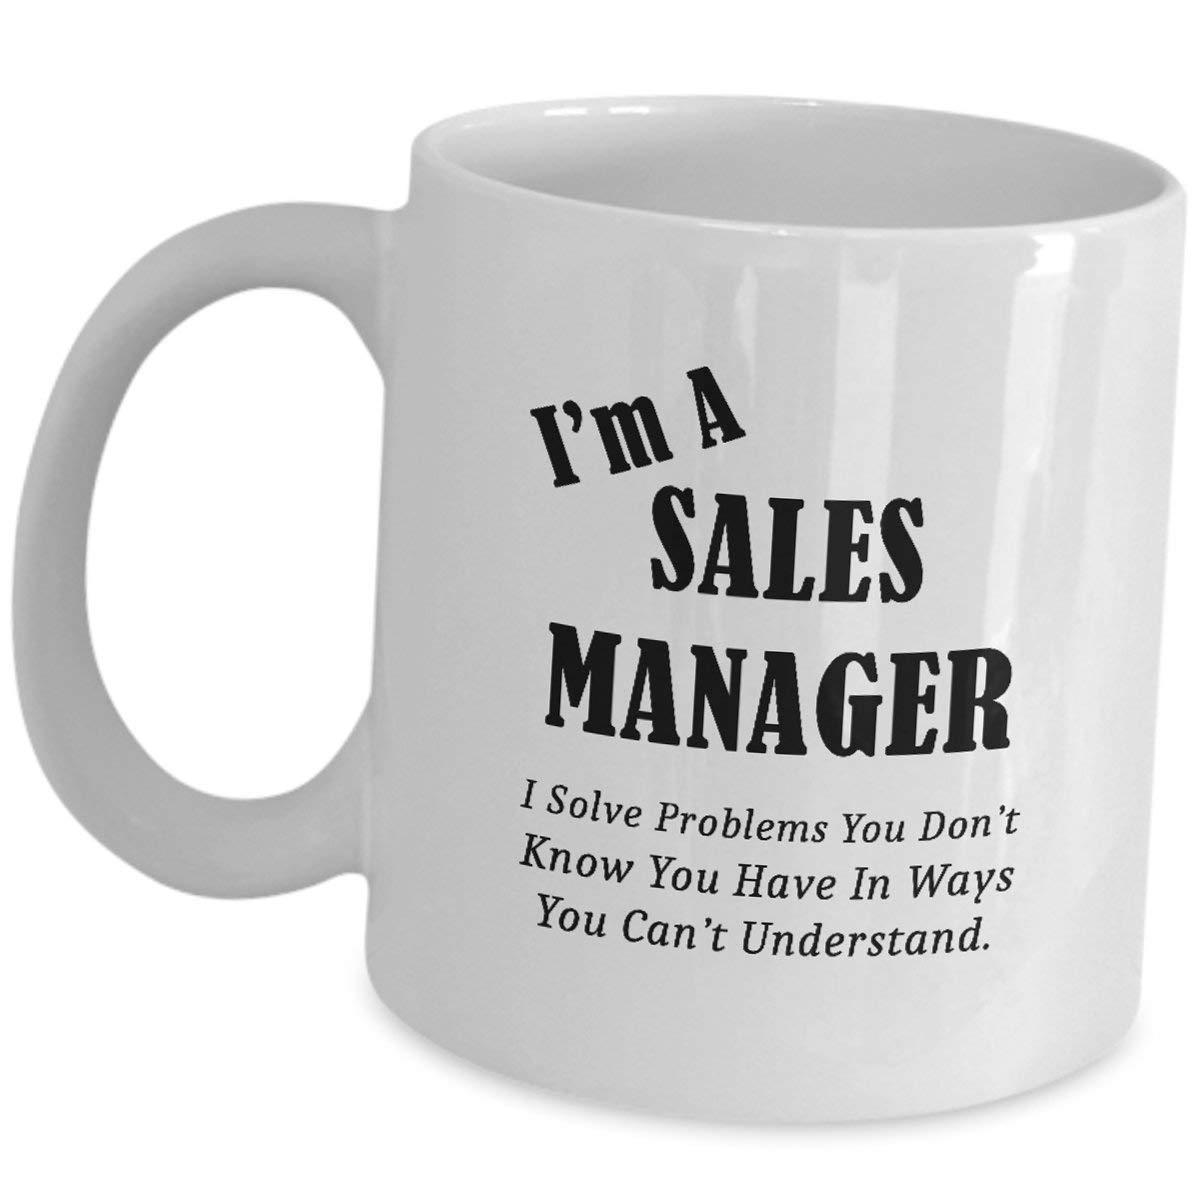 Im A Sales Managerコーヒーカップギフト – マグティーセラミックおもしろキュートなギャグ シーン オンシャツ メンズ レディース 感謝ギフト ビジネス アドミン マーケティング – I Solve Problems In Ways You Cant   B07HQMG152